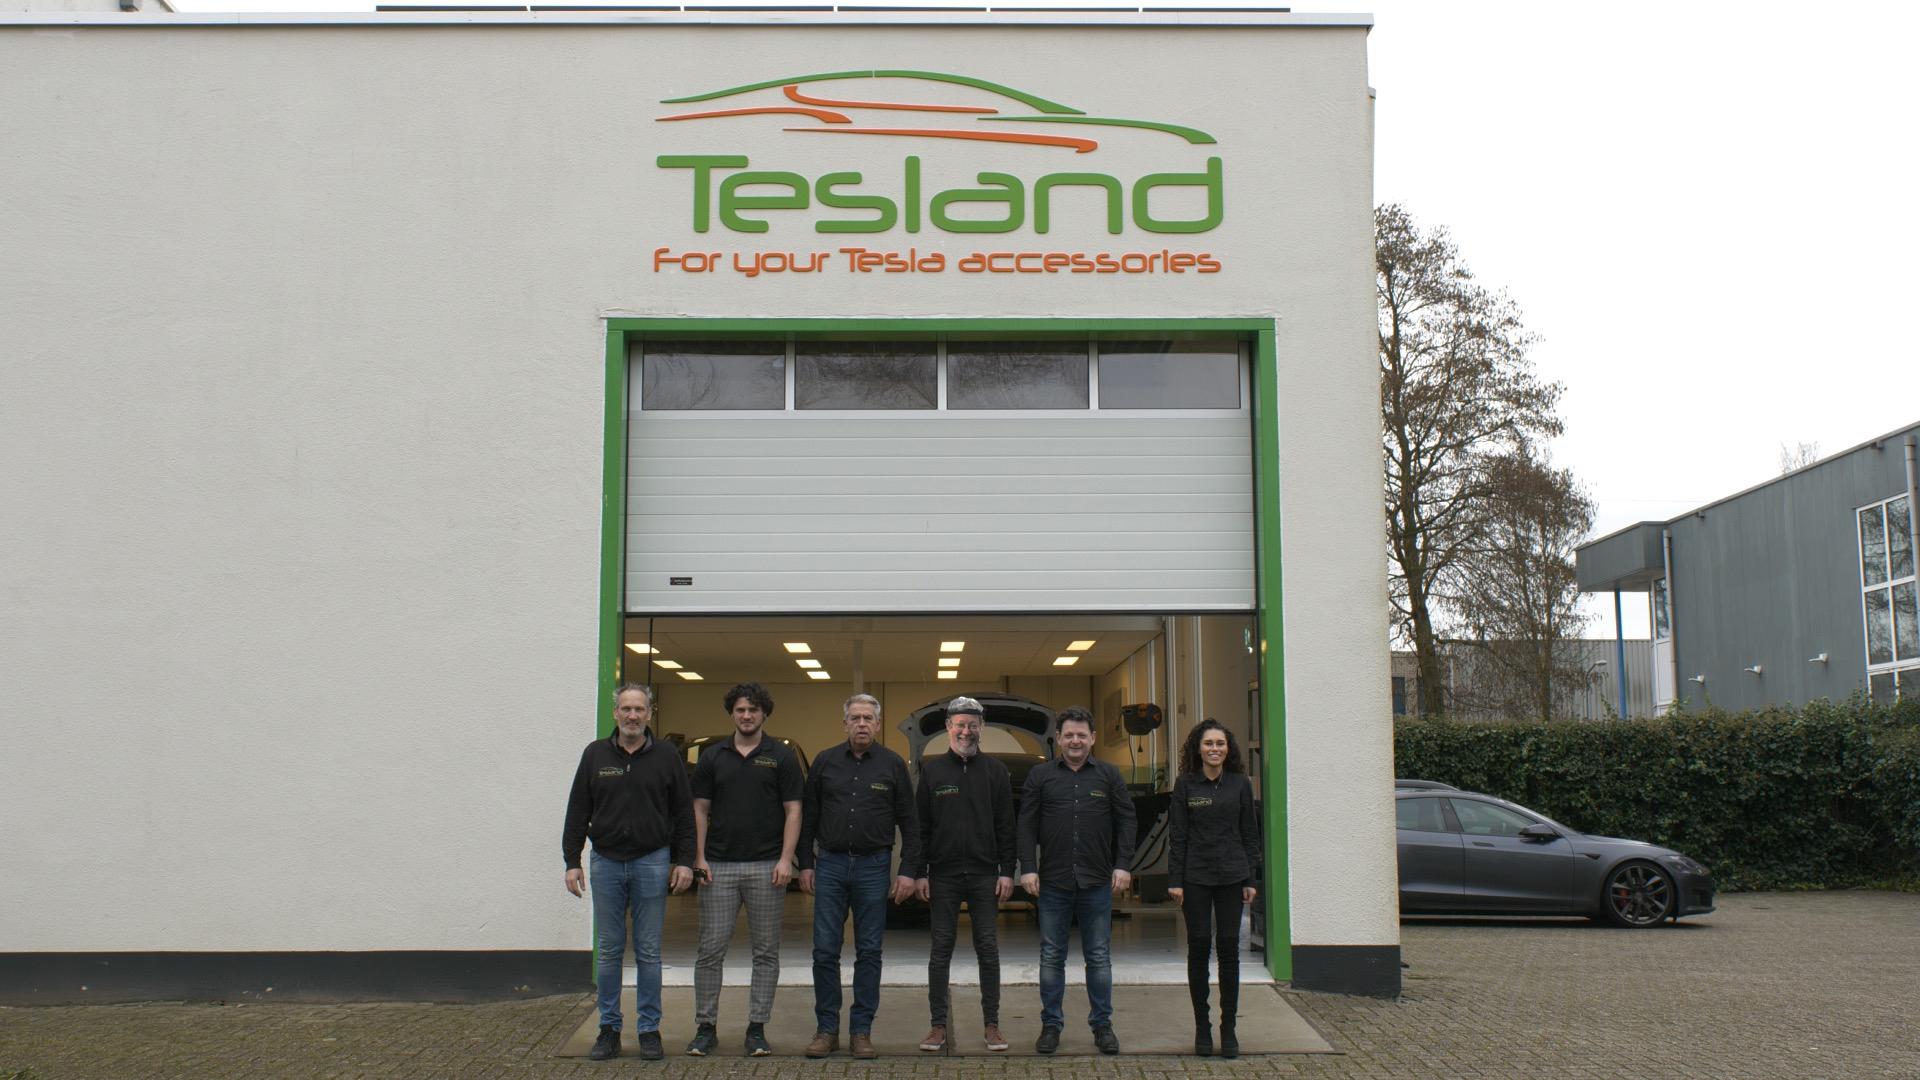 Team Tesland